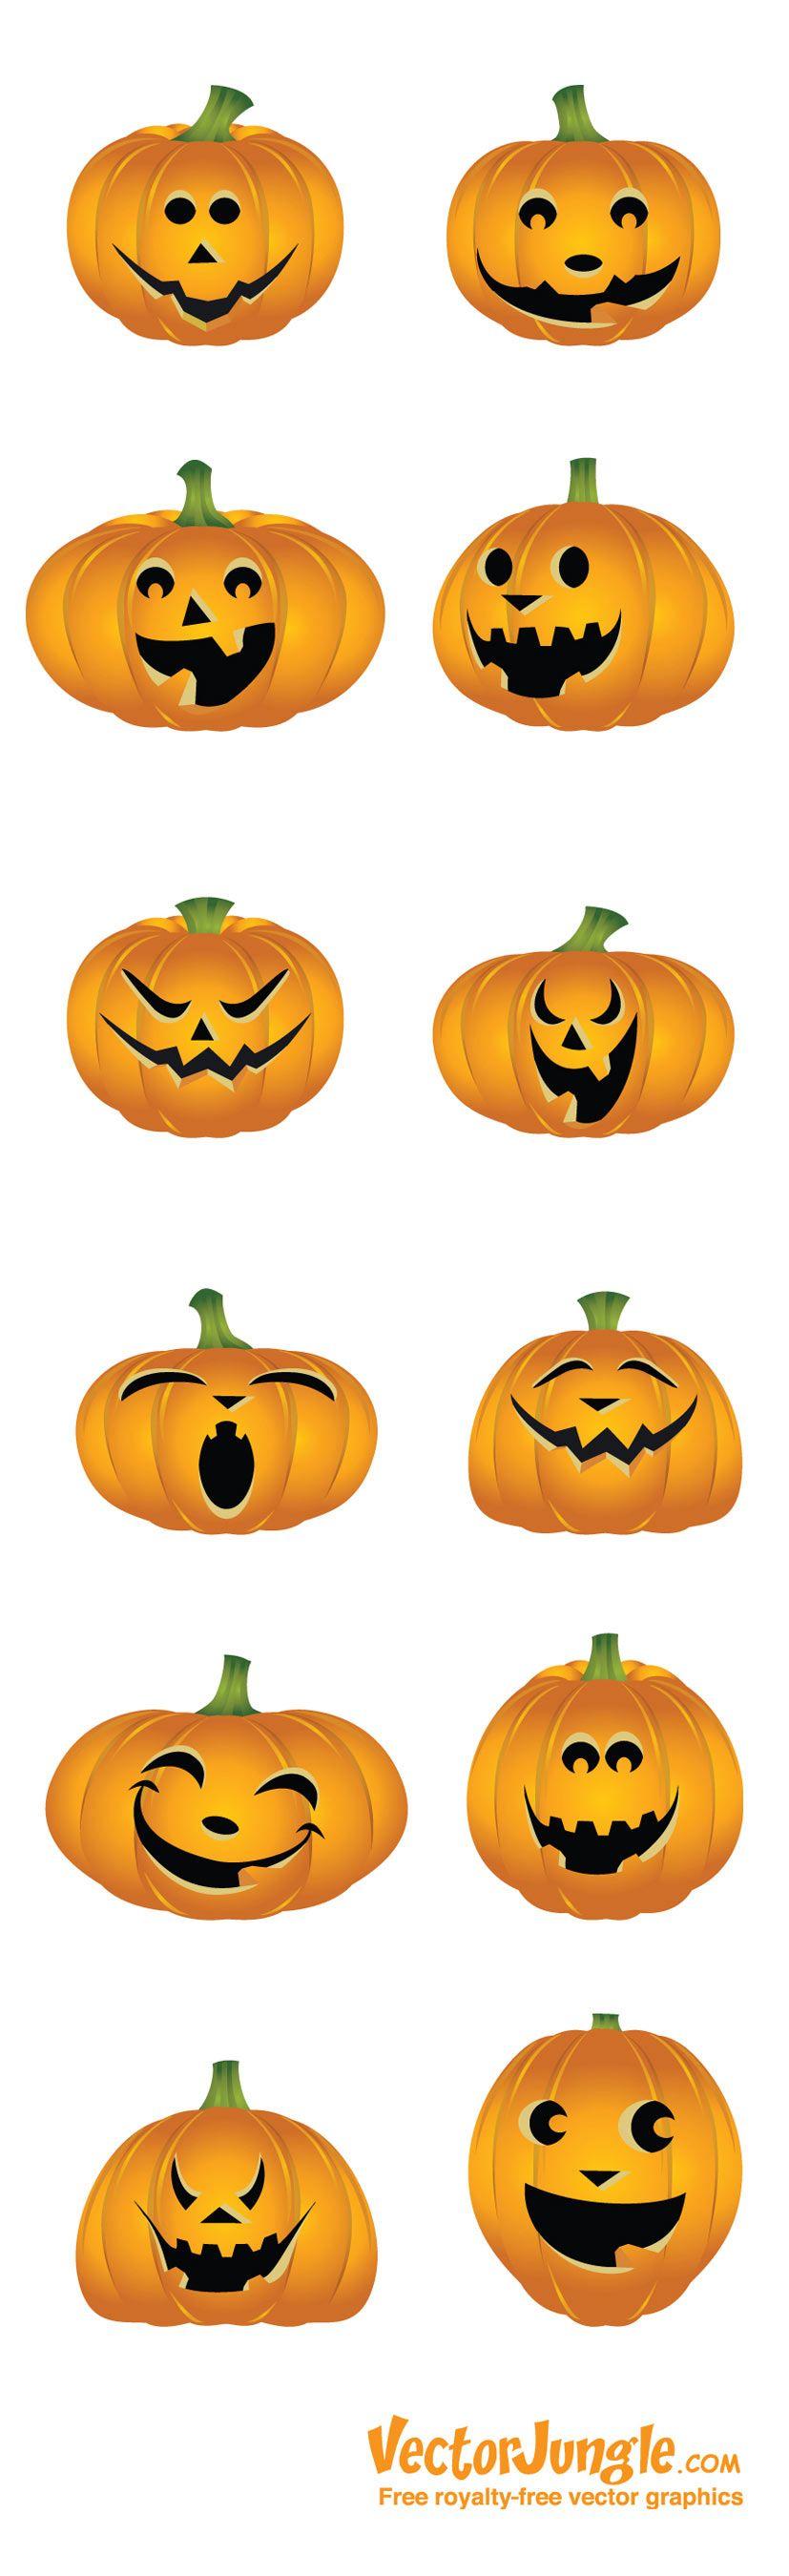 Calabazas para Halloween. | Humor e imágenes divertidas | Pinterest ...